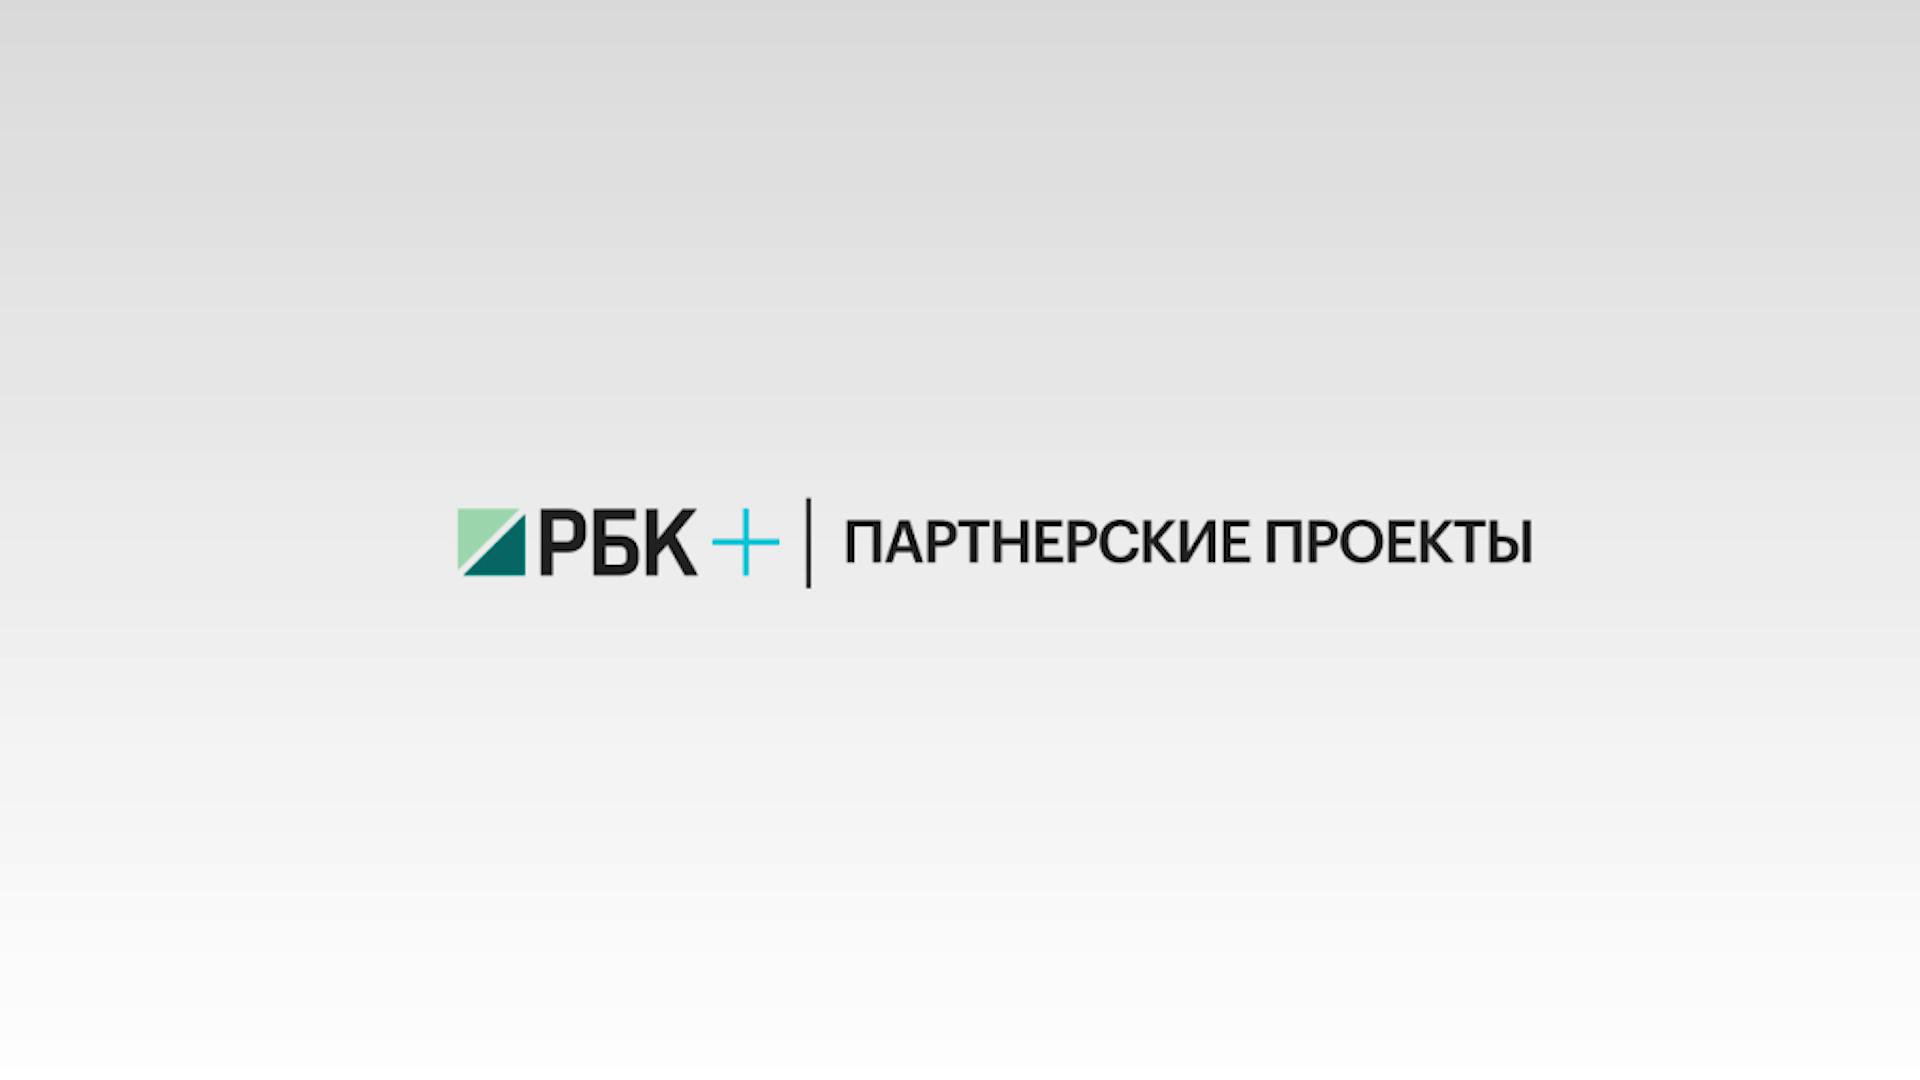 Programme: РБК+ / Итоги года